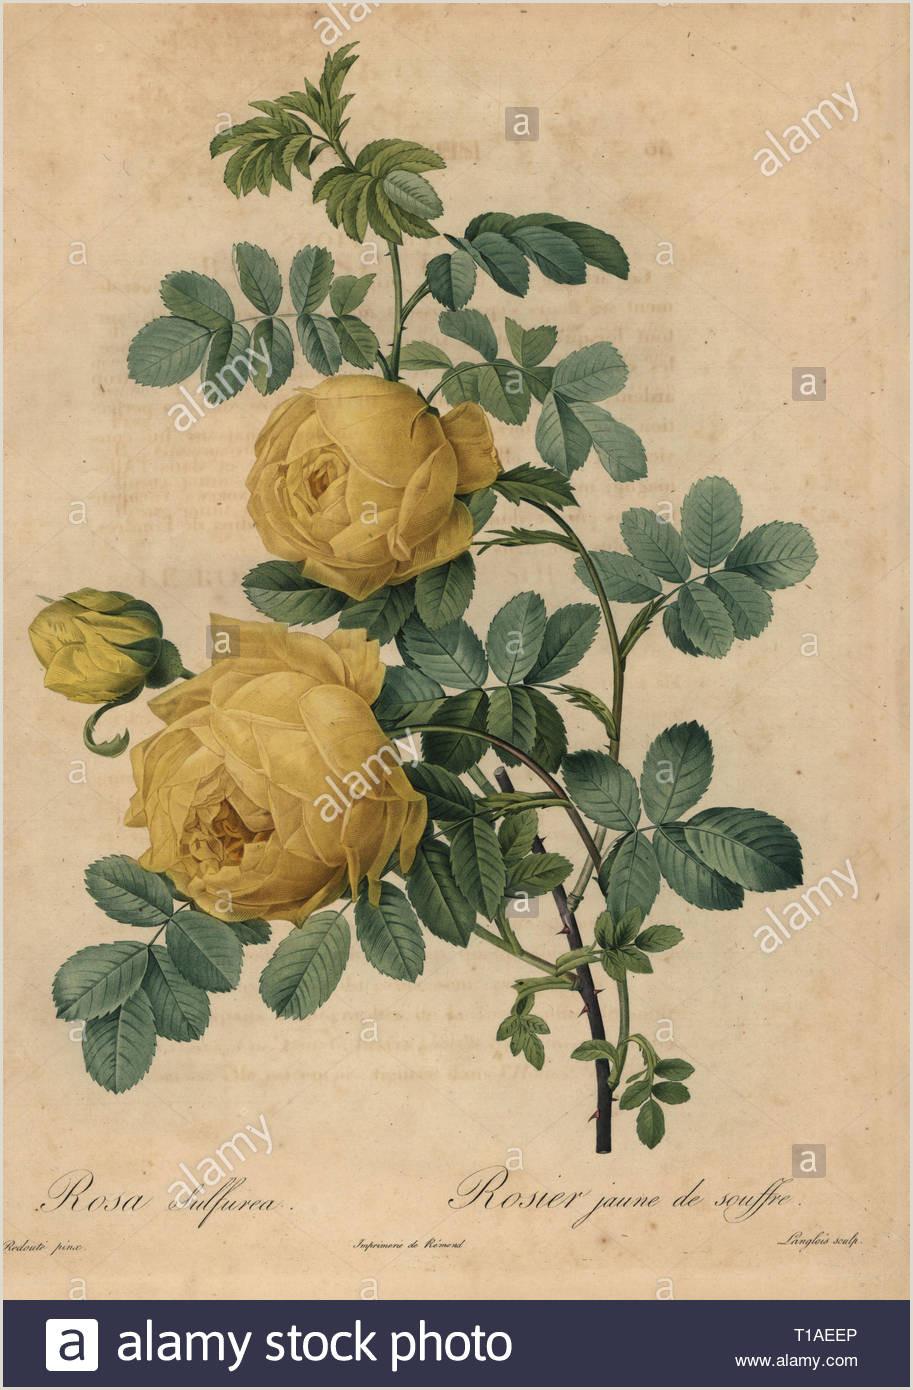 Hoja De Vida Minerva.com Jaune Rose Imágenes De Stock & Jaune Rose Fotos De Stock Alamy